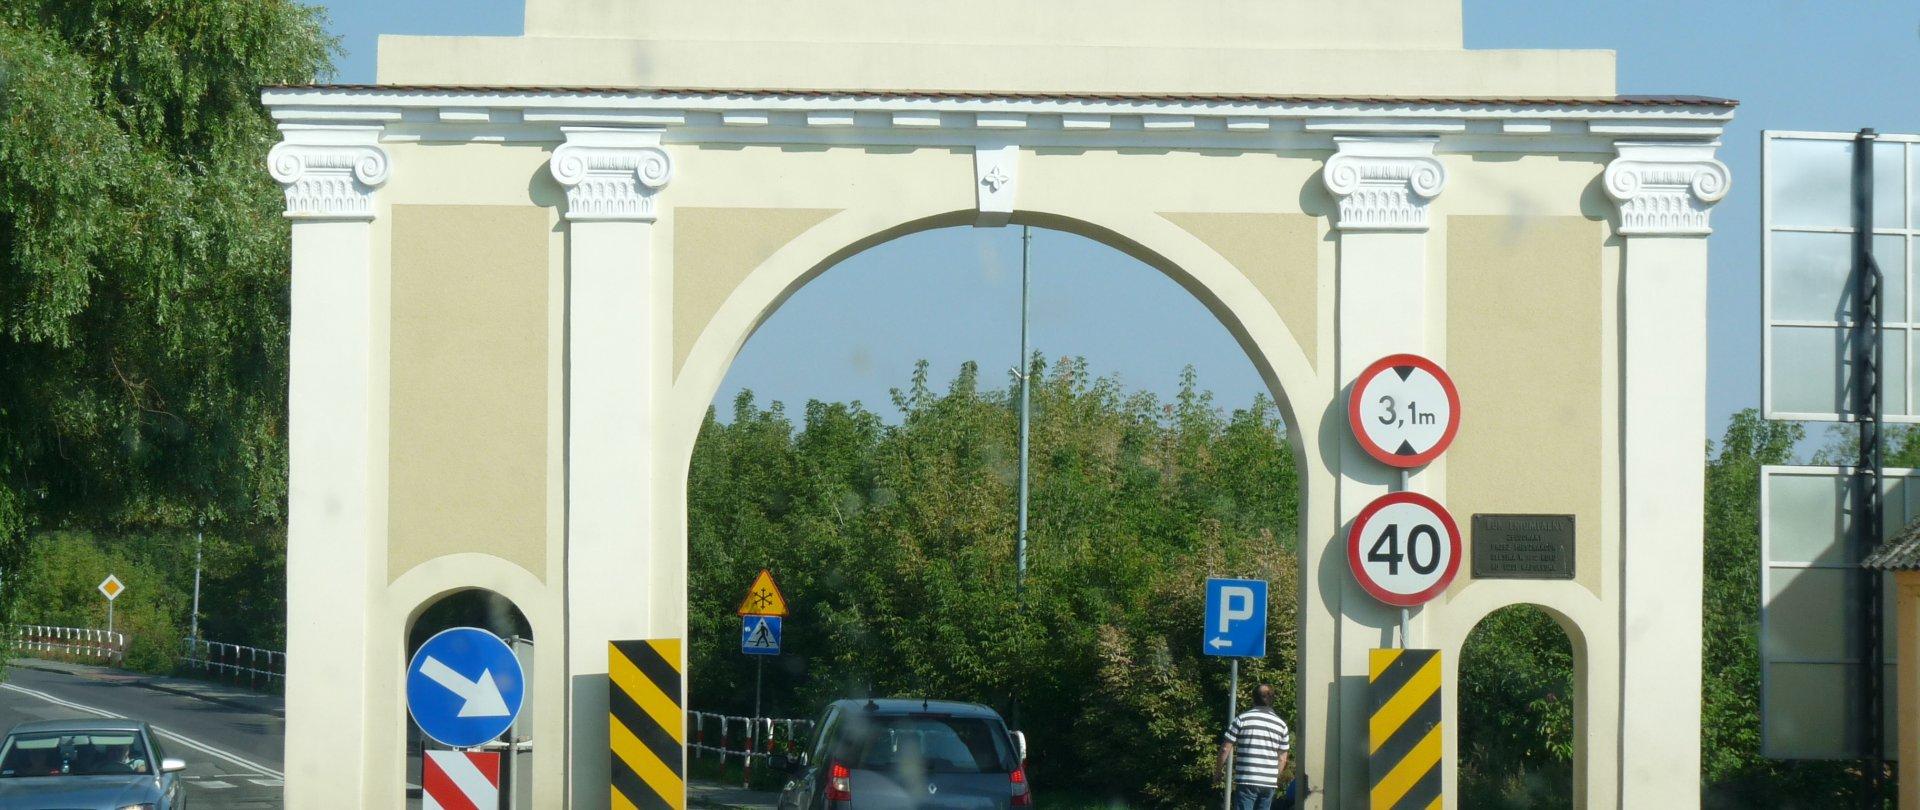 Napoleonian Gate in Ślesin